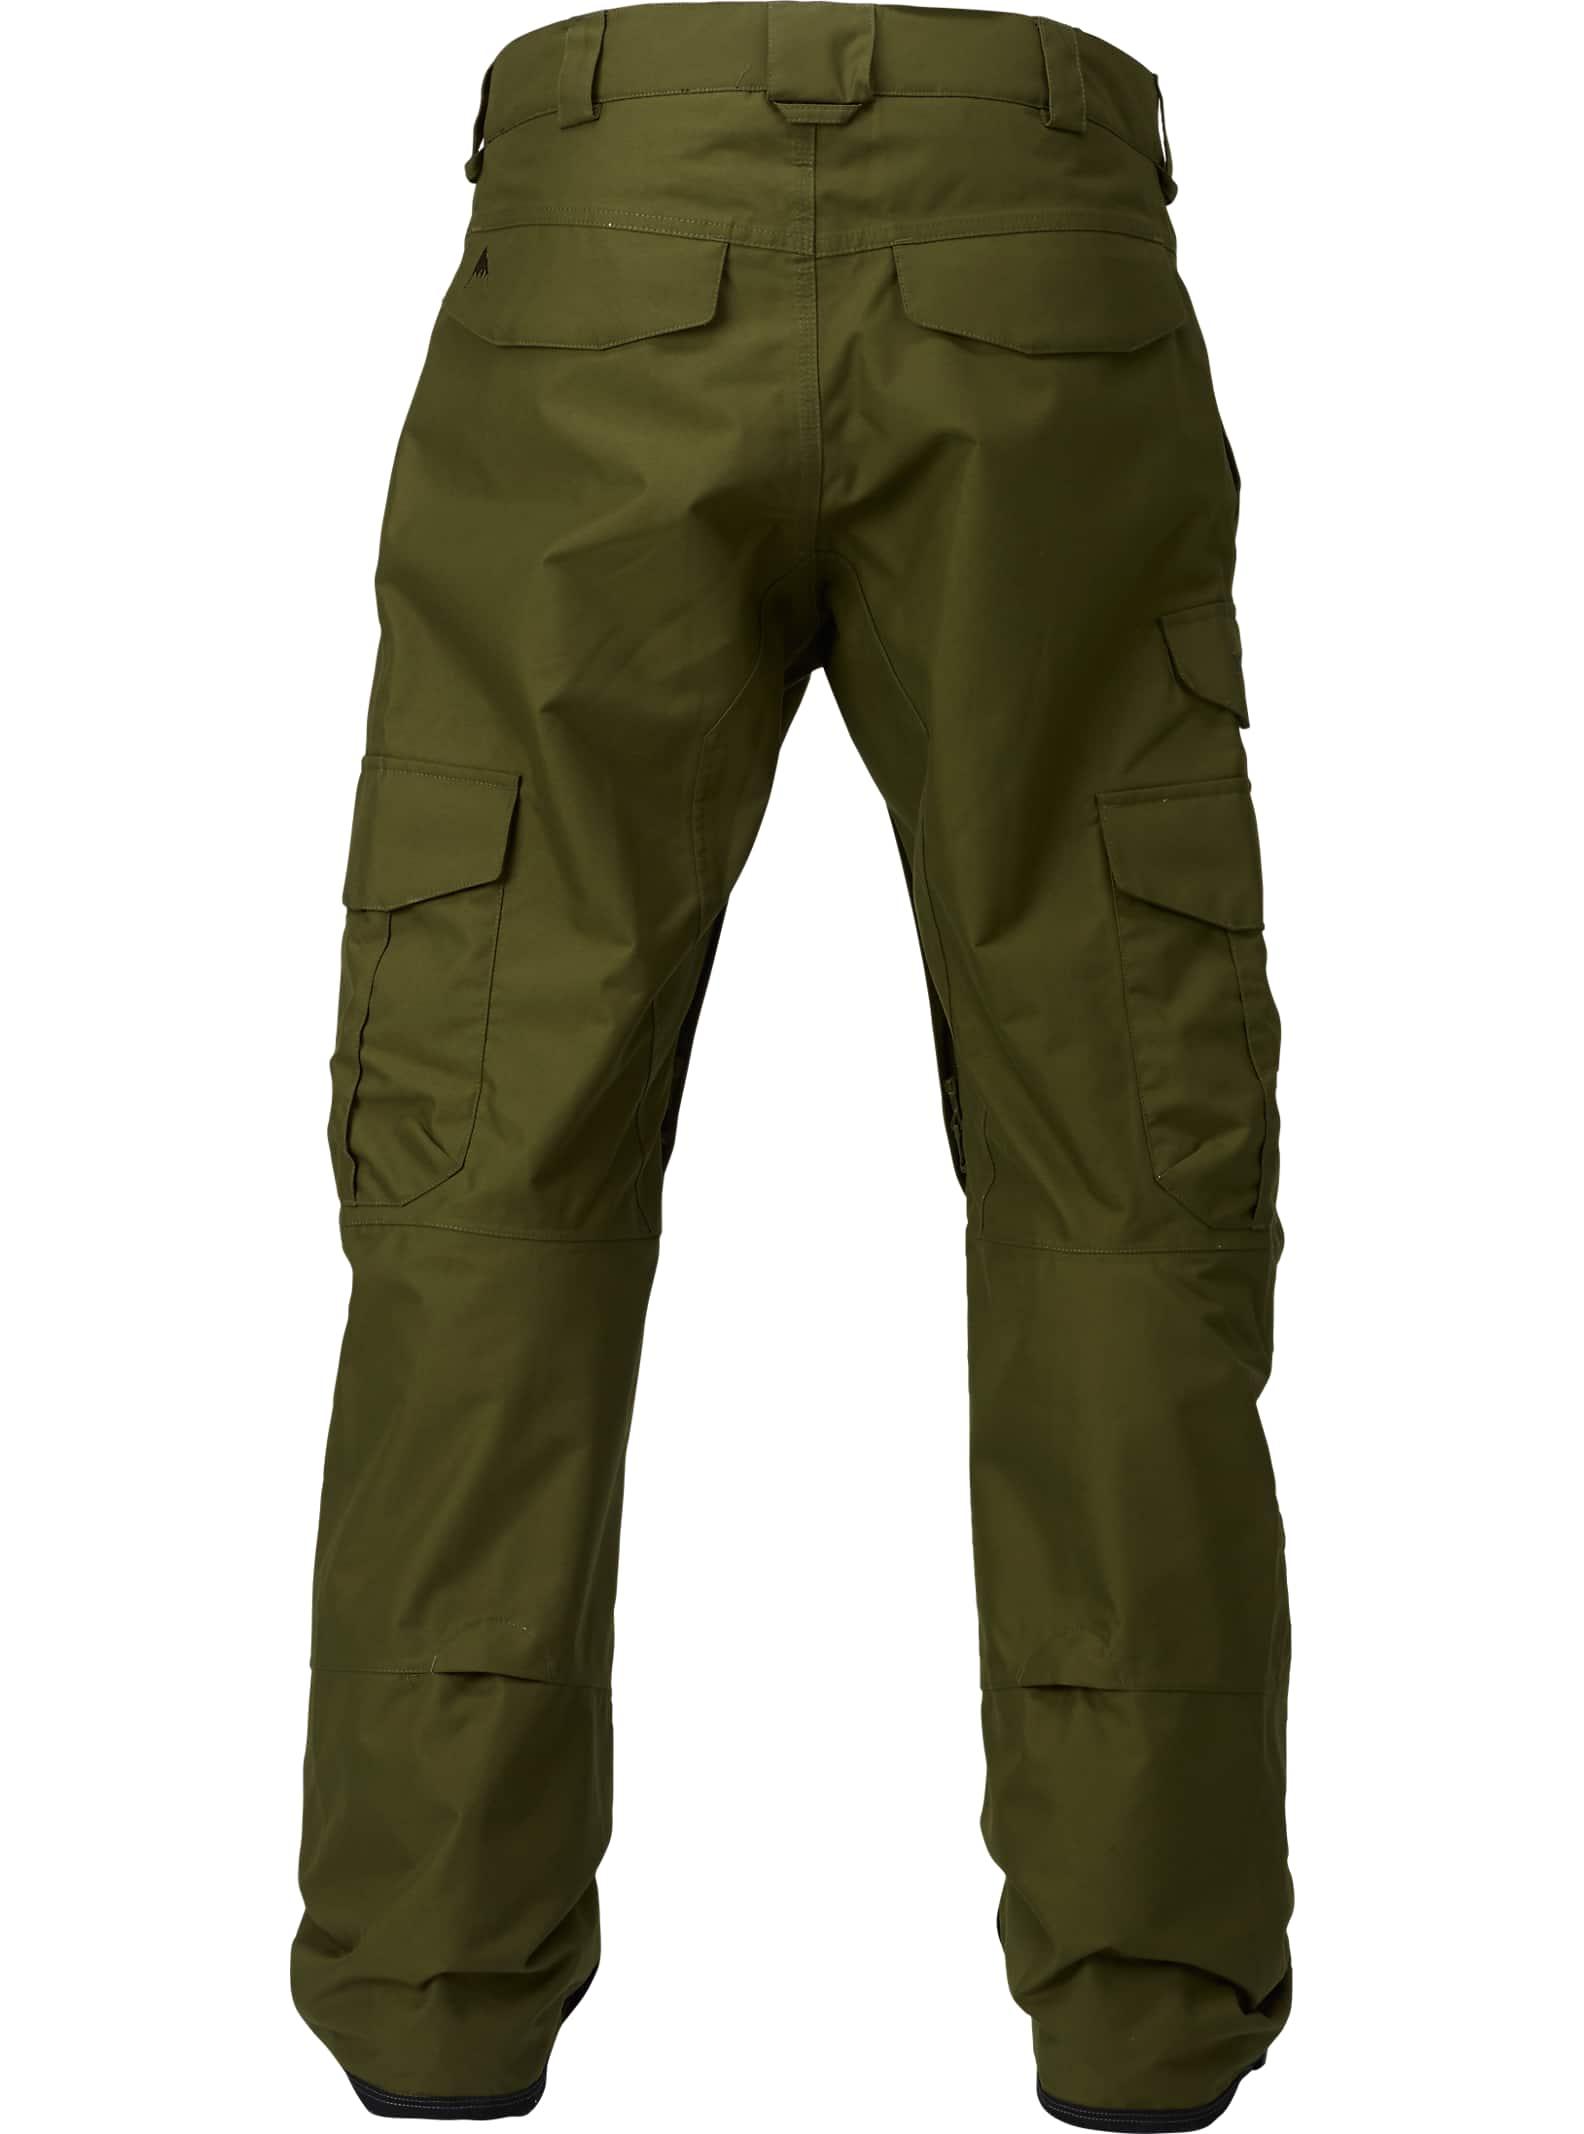 Burton Cargo Pant - Regular Fit  98f4a25c9